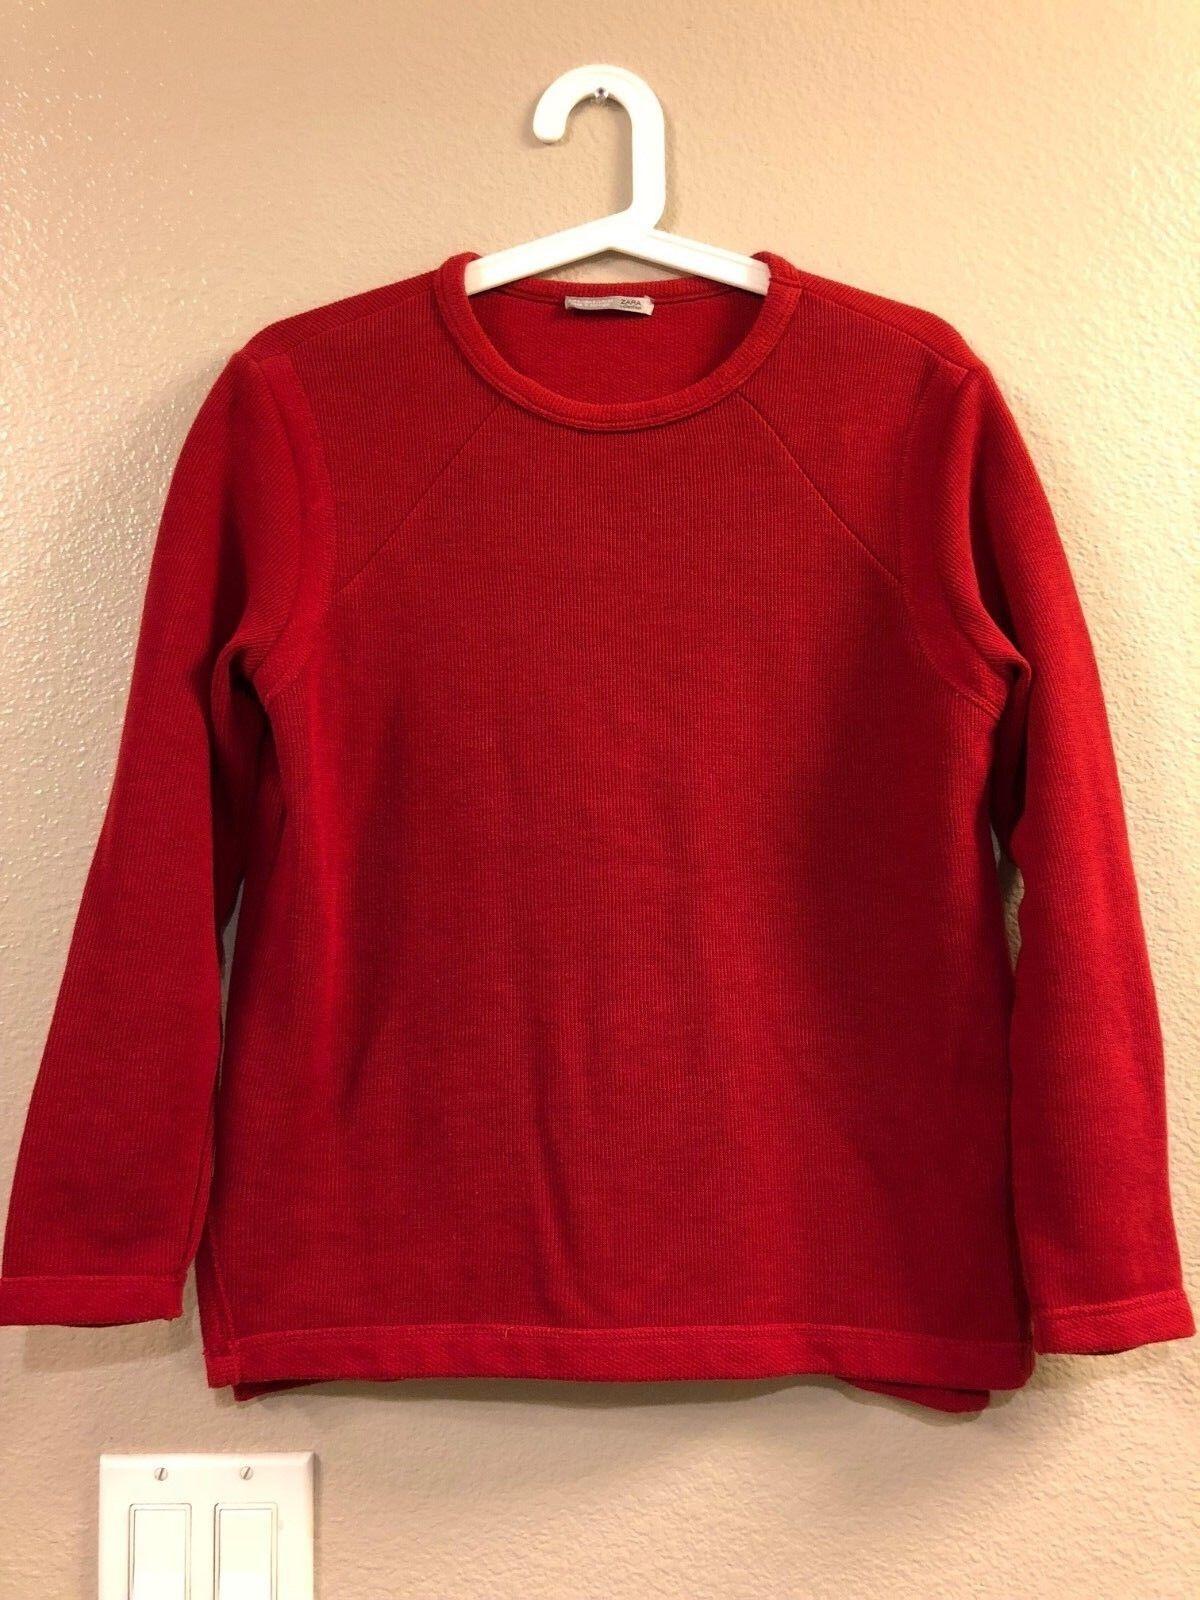 Zara Women Sweatshirt Red Size S